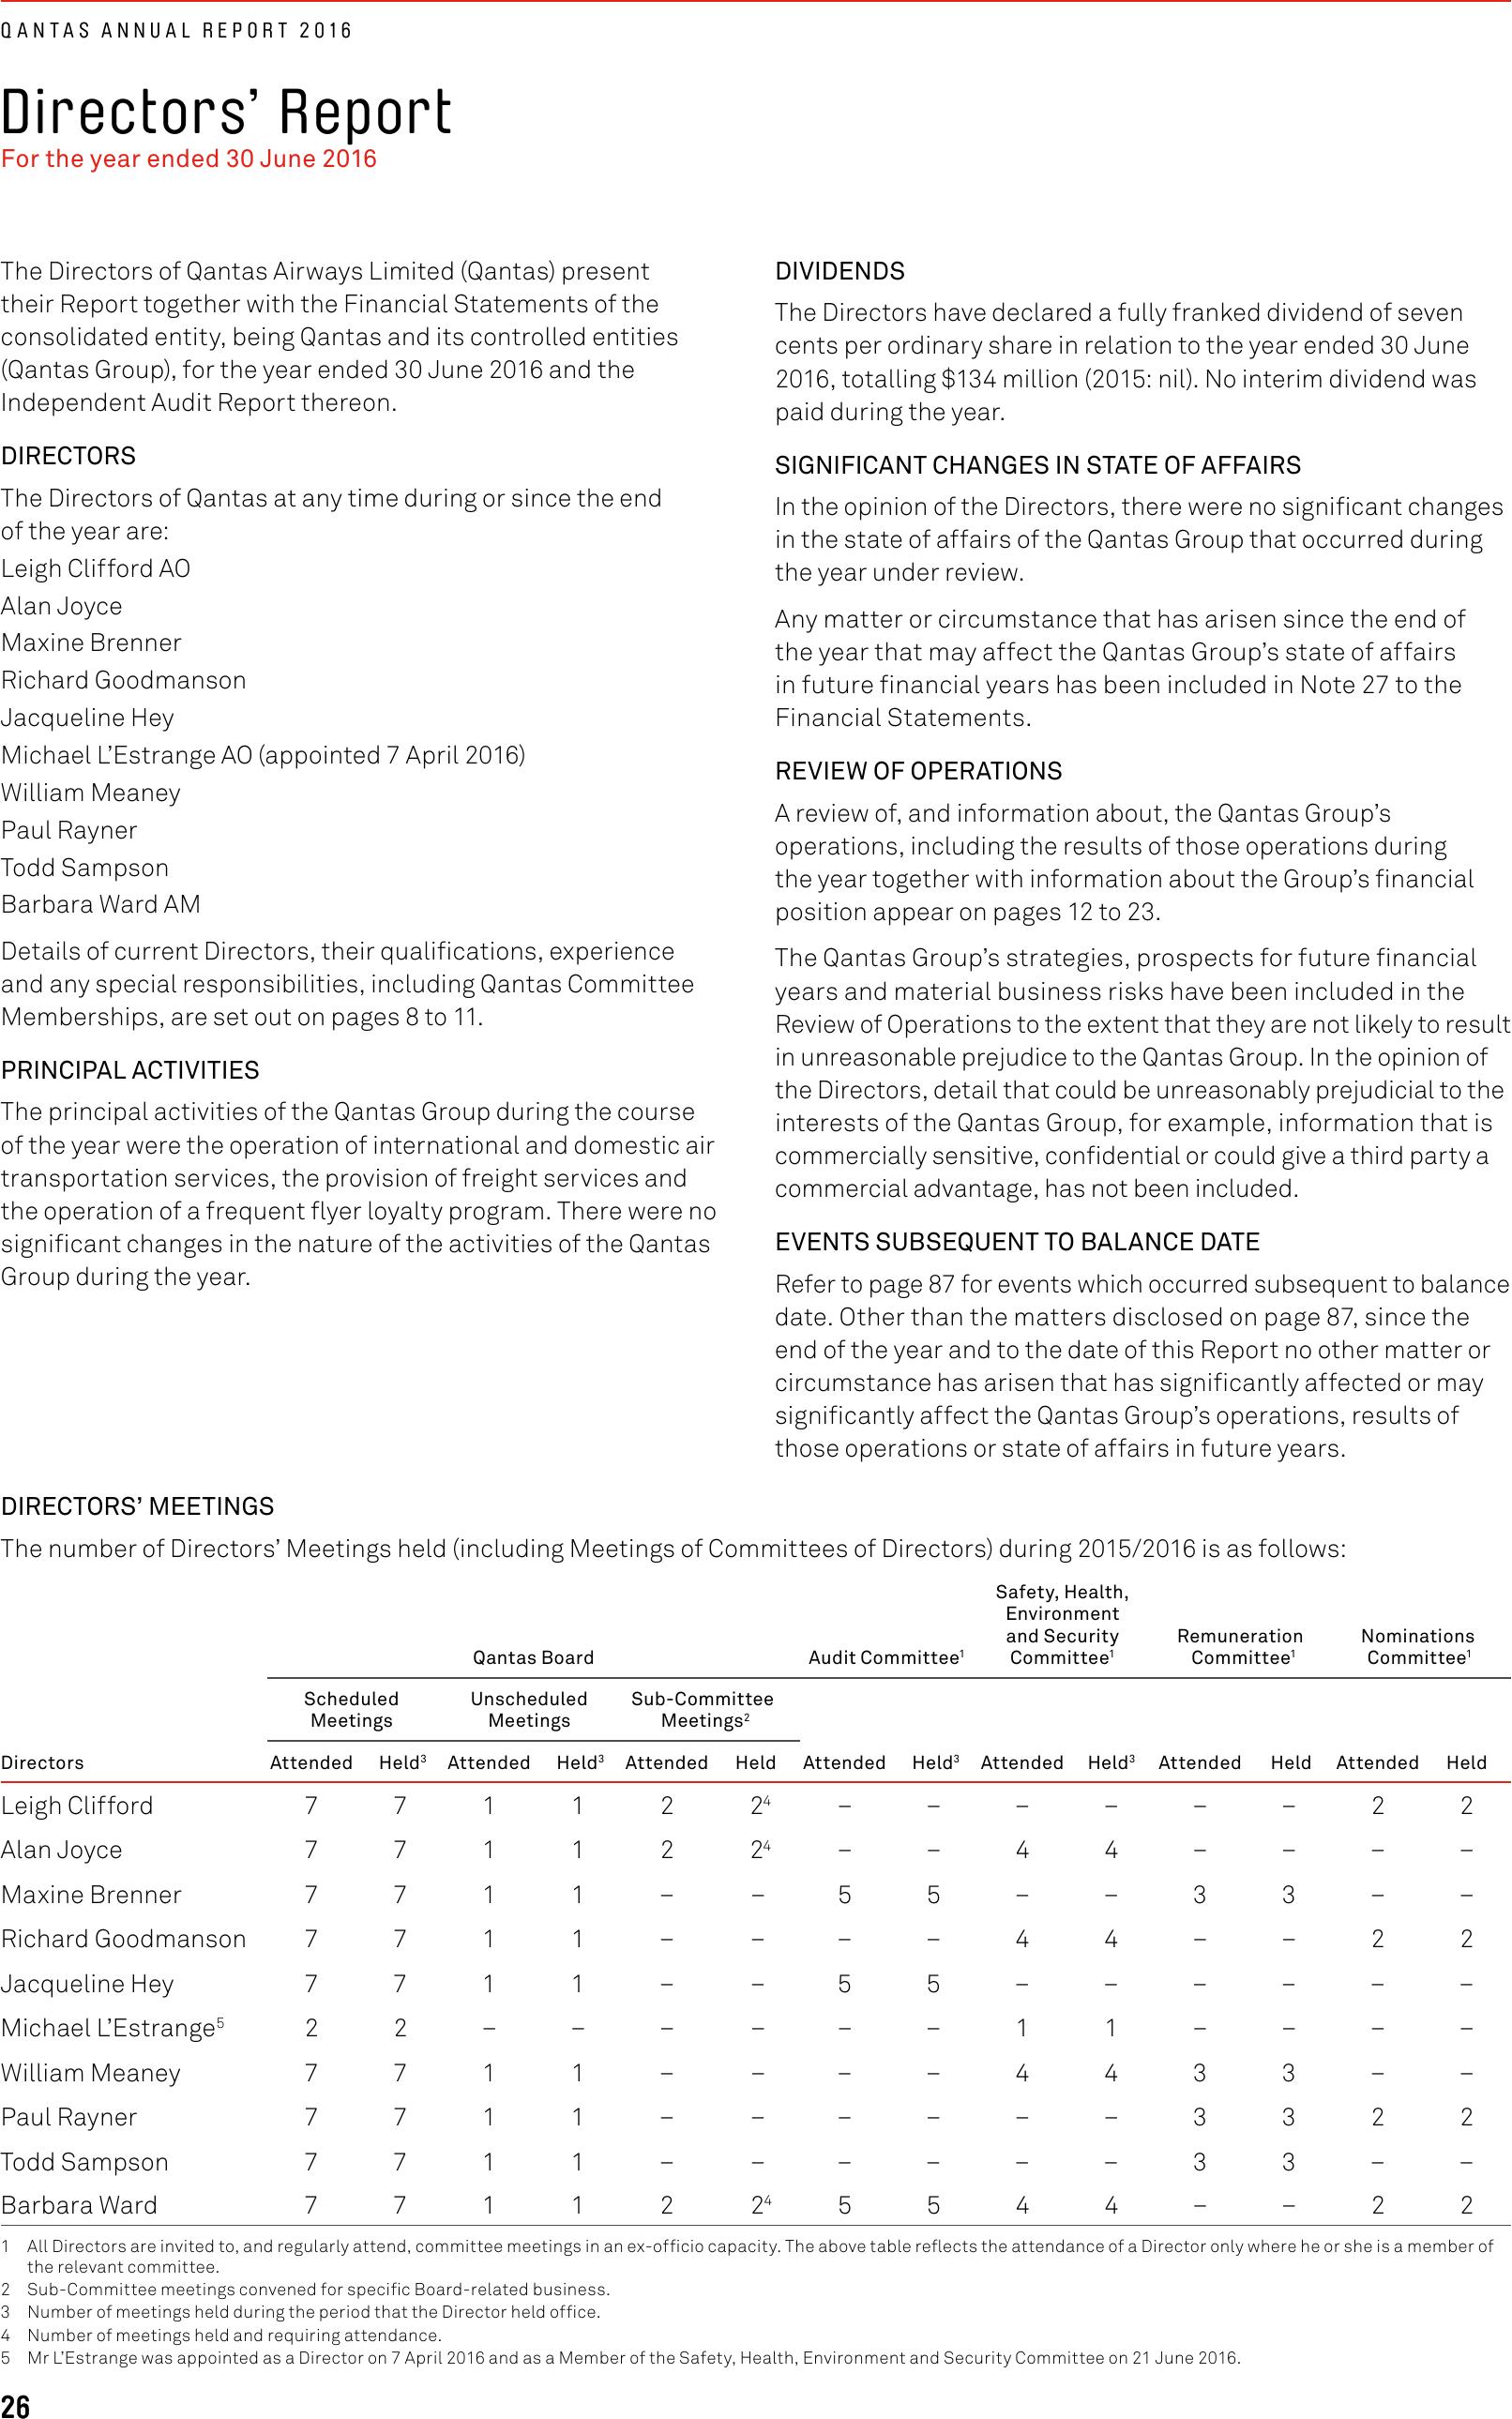 Essay writing help me help